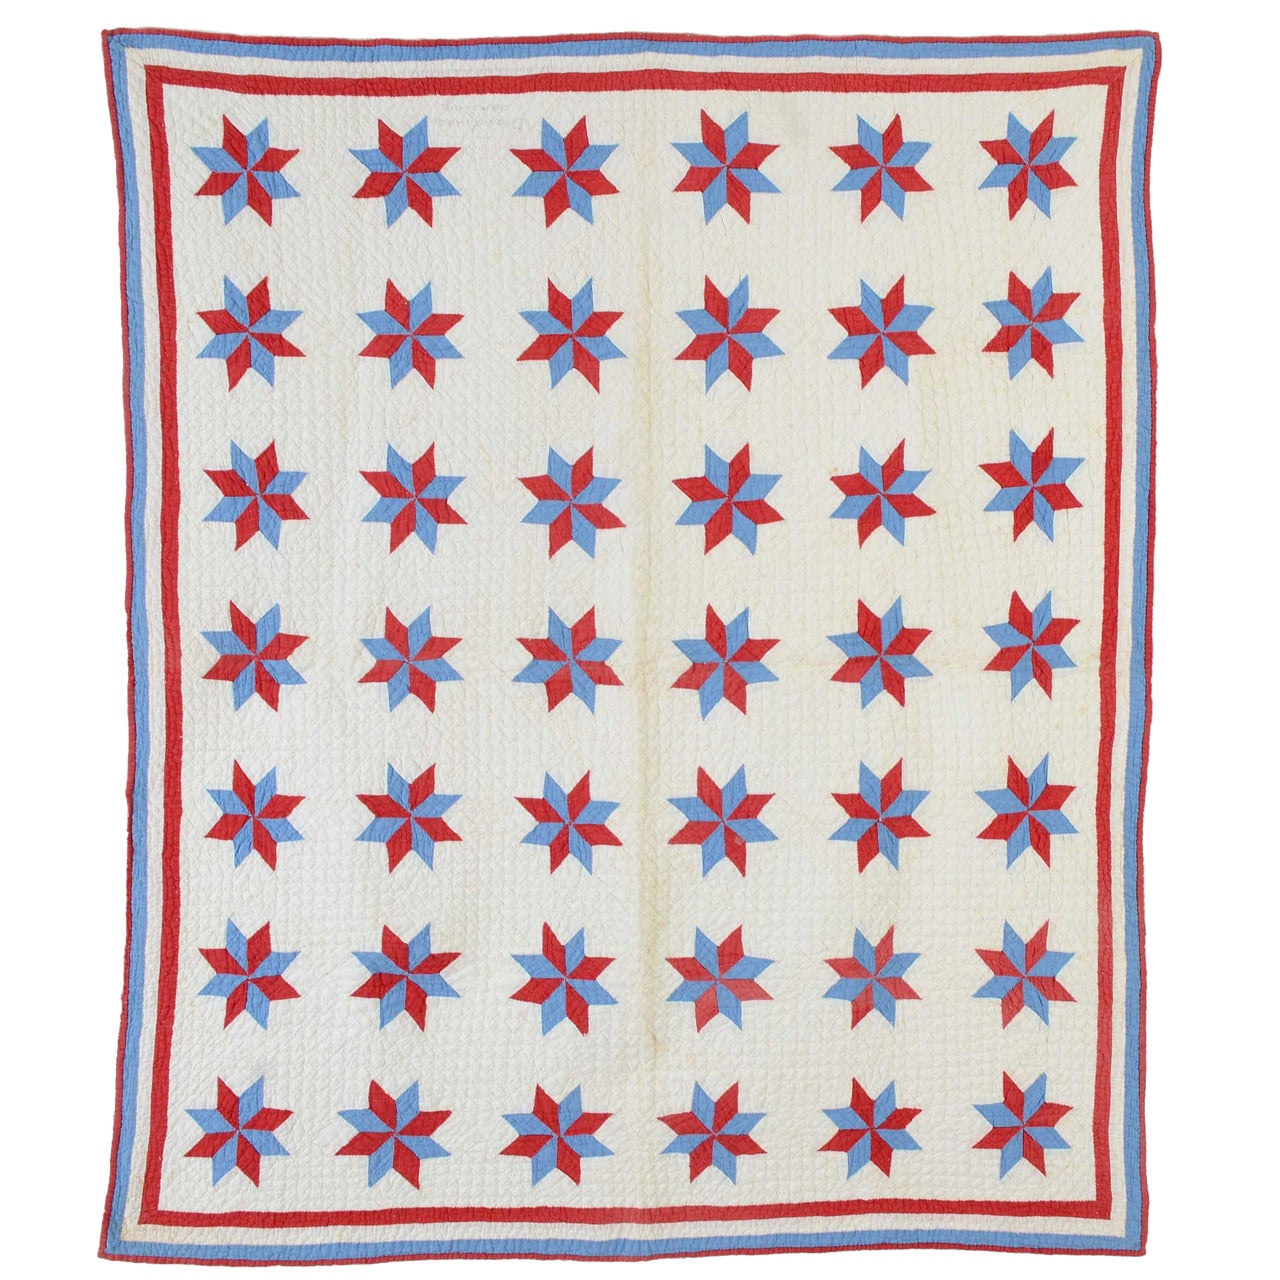 LeMoyne Stars Crib Quilt